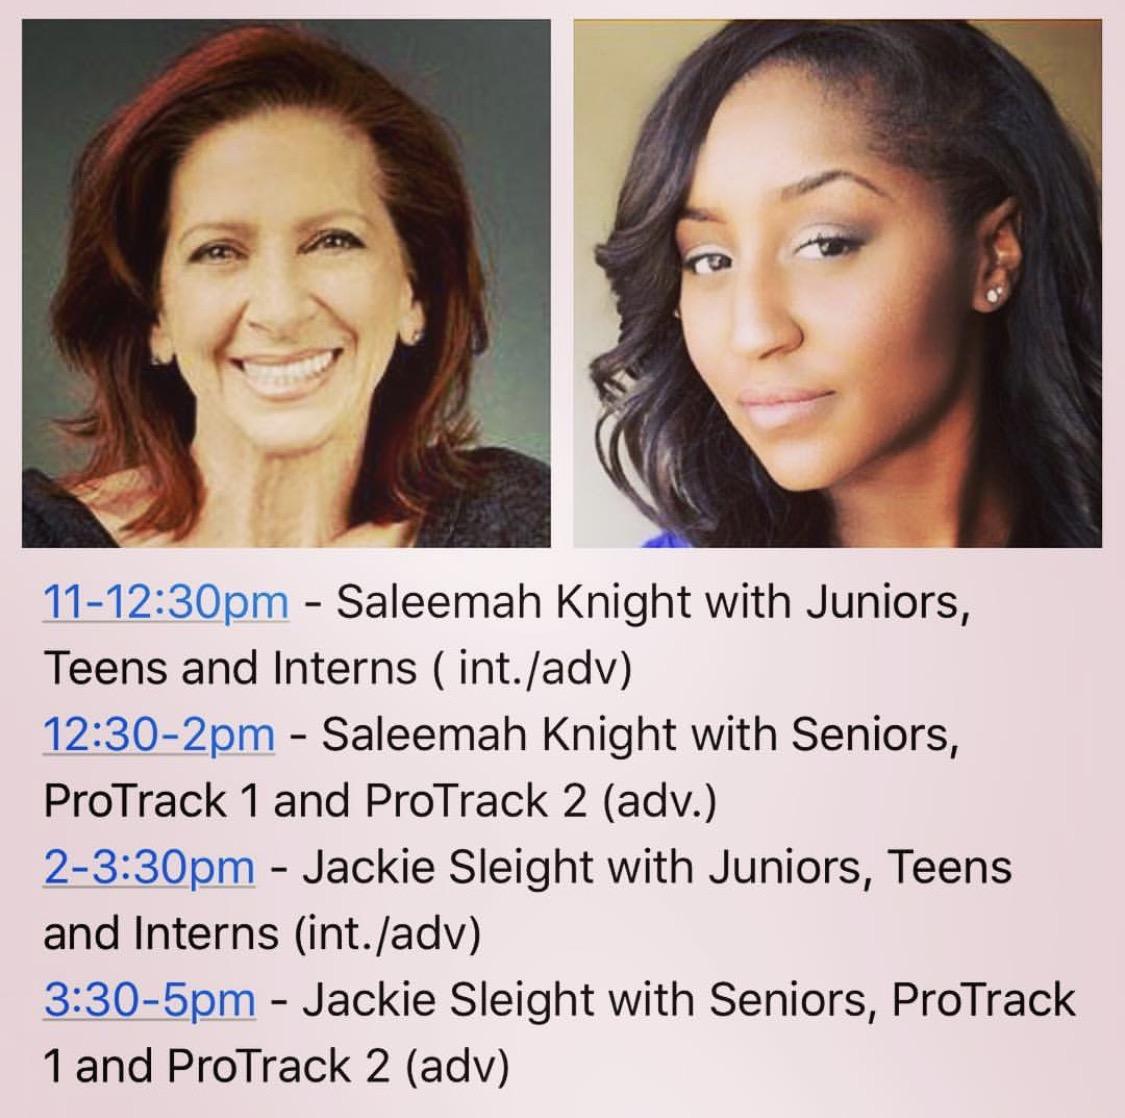 Michelle Latimer Dance Academy 2017- Guest Master Class with Saleemah E. Knight